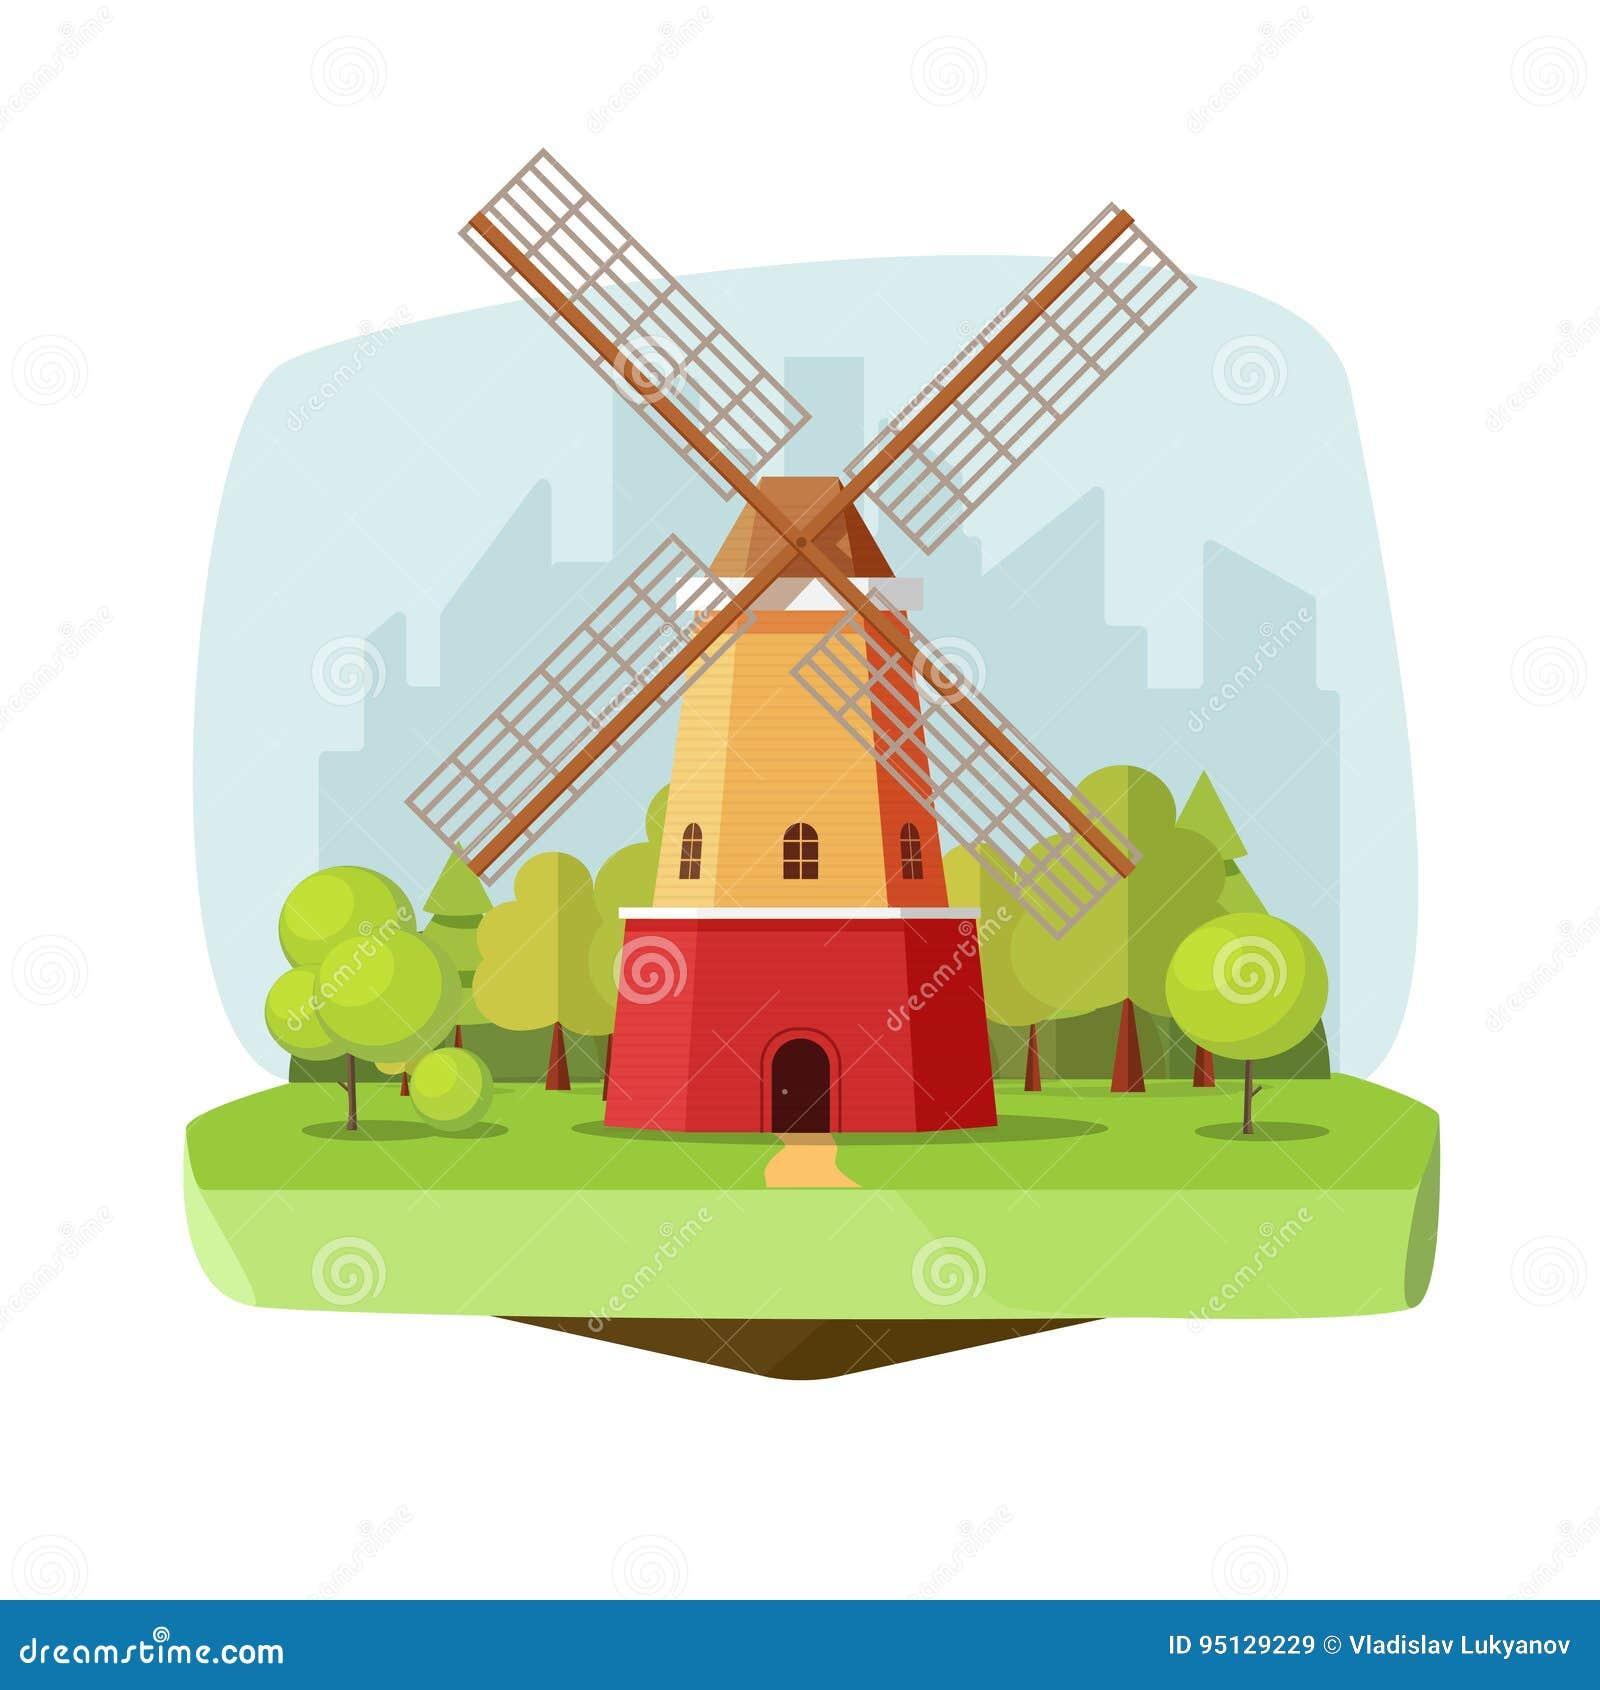 Mill Farm On Nature Landscape Vector Illustration Flat Carton Retro Dutch Windmill Near Forest On City Background Stock Vector Illustration Of Dutch Bread 95129229